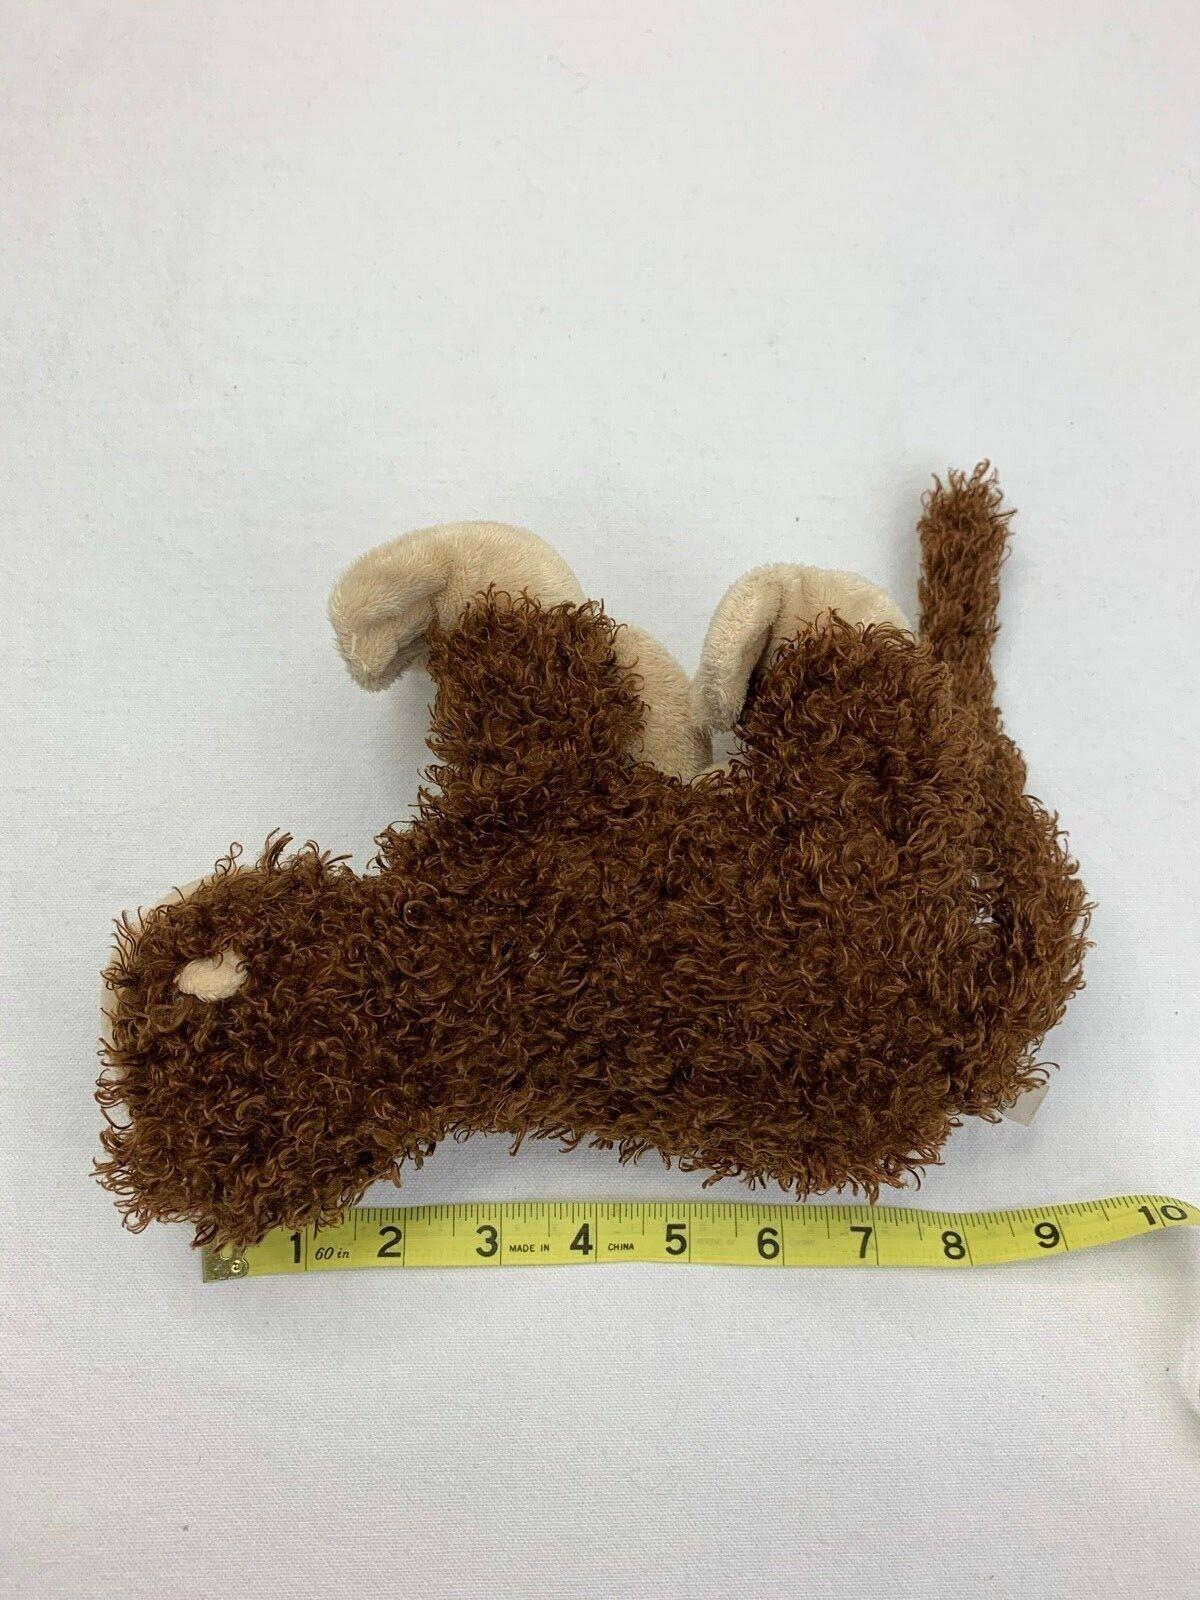 Ganz Webkinz Cheeky Monkey NO CODE Plush Stuffed Toy Excellent Condition